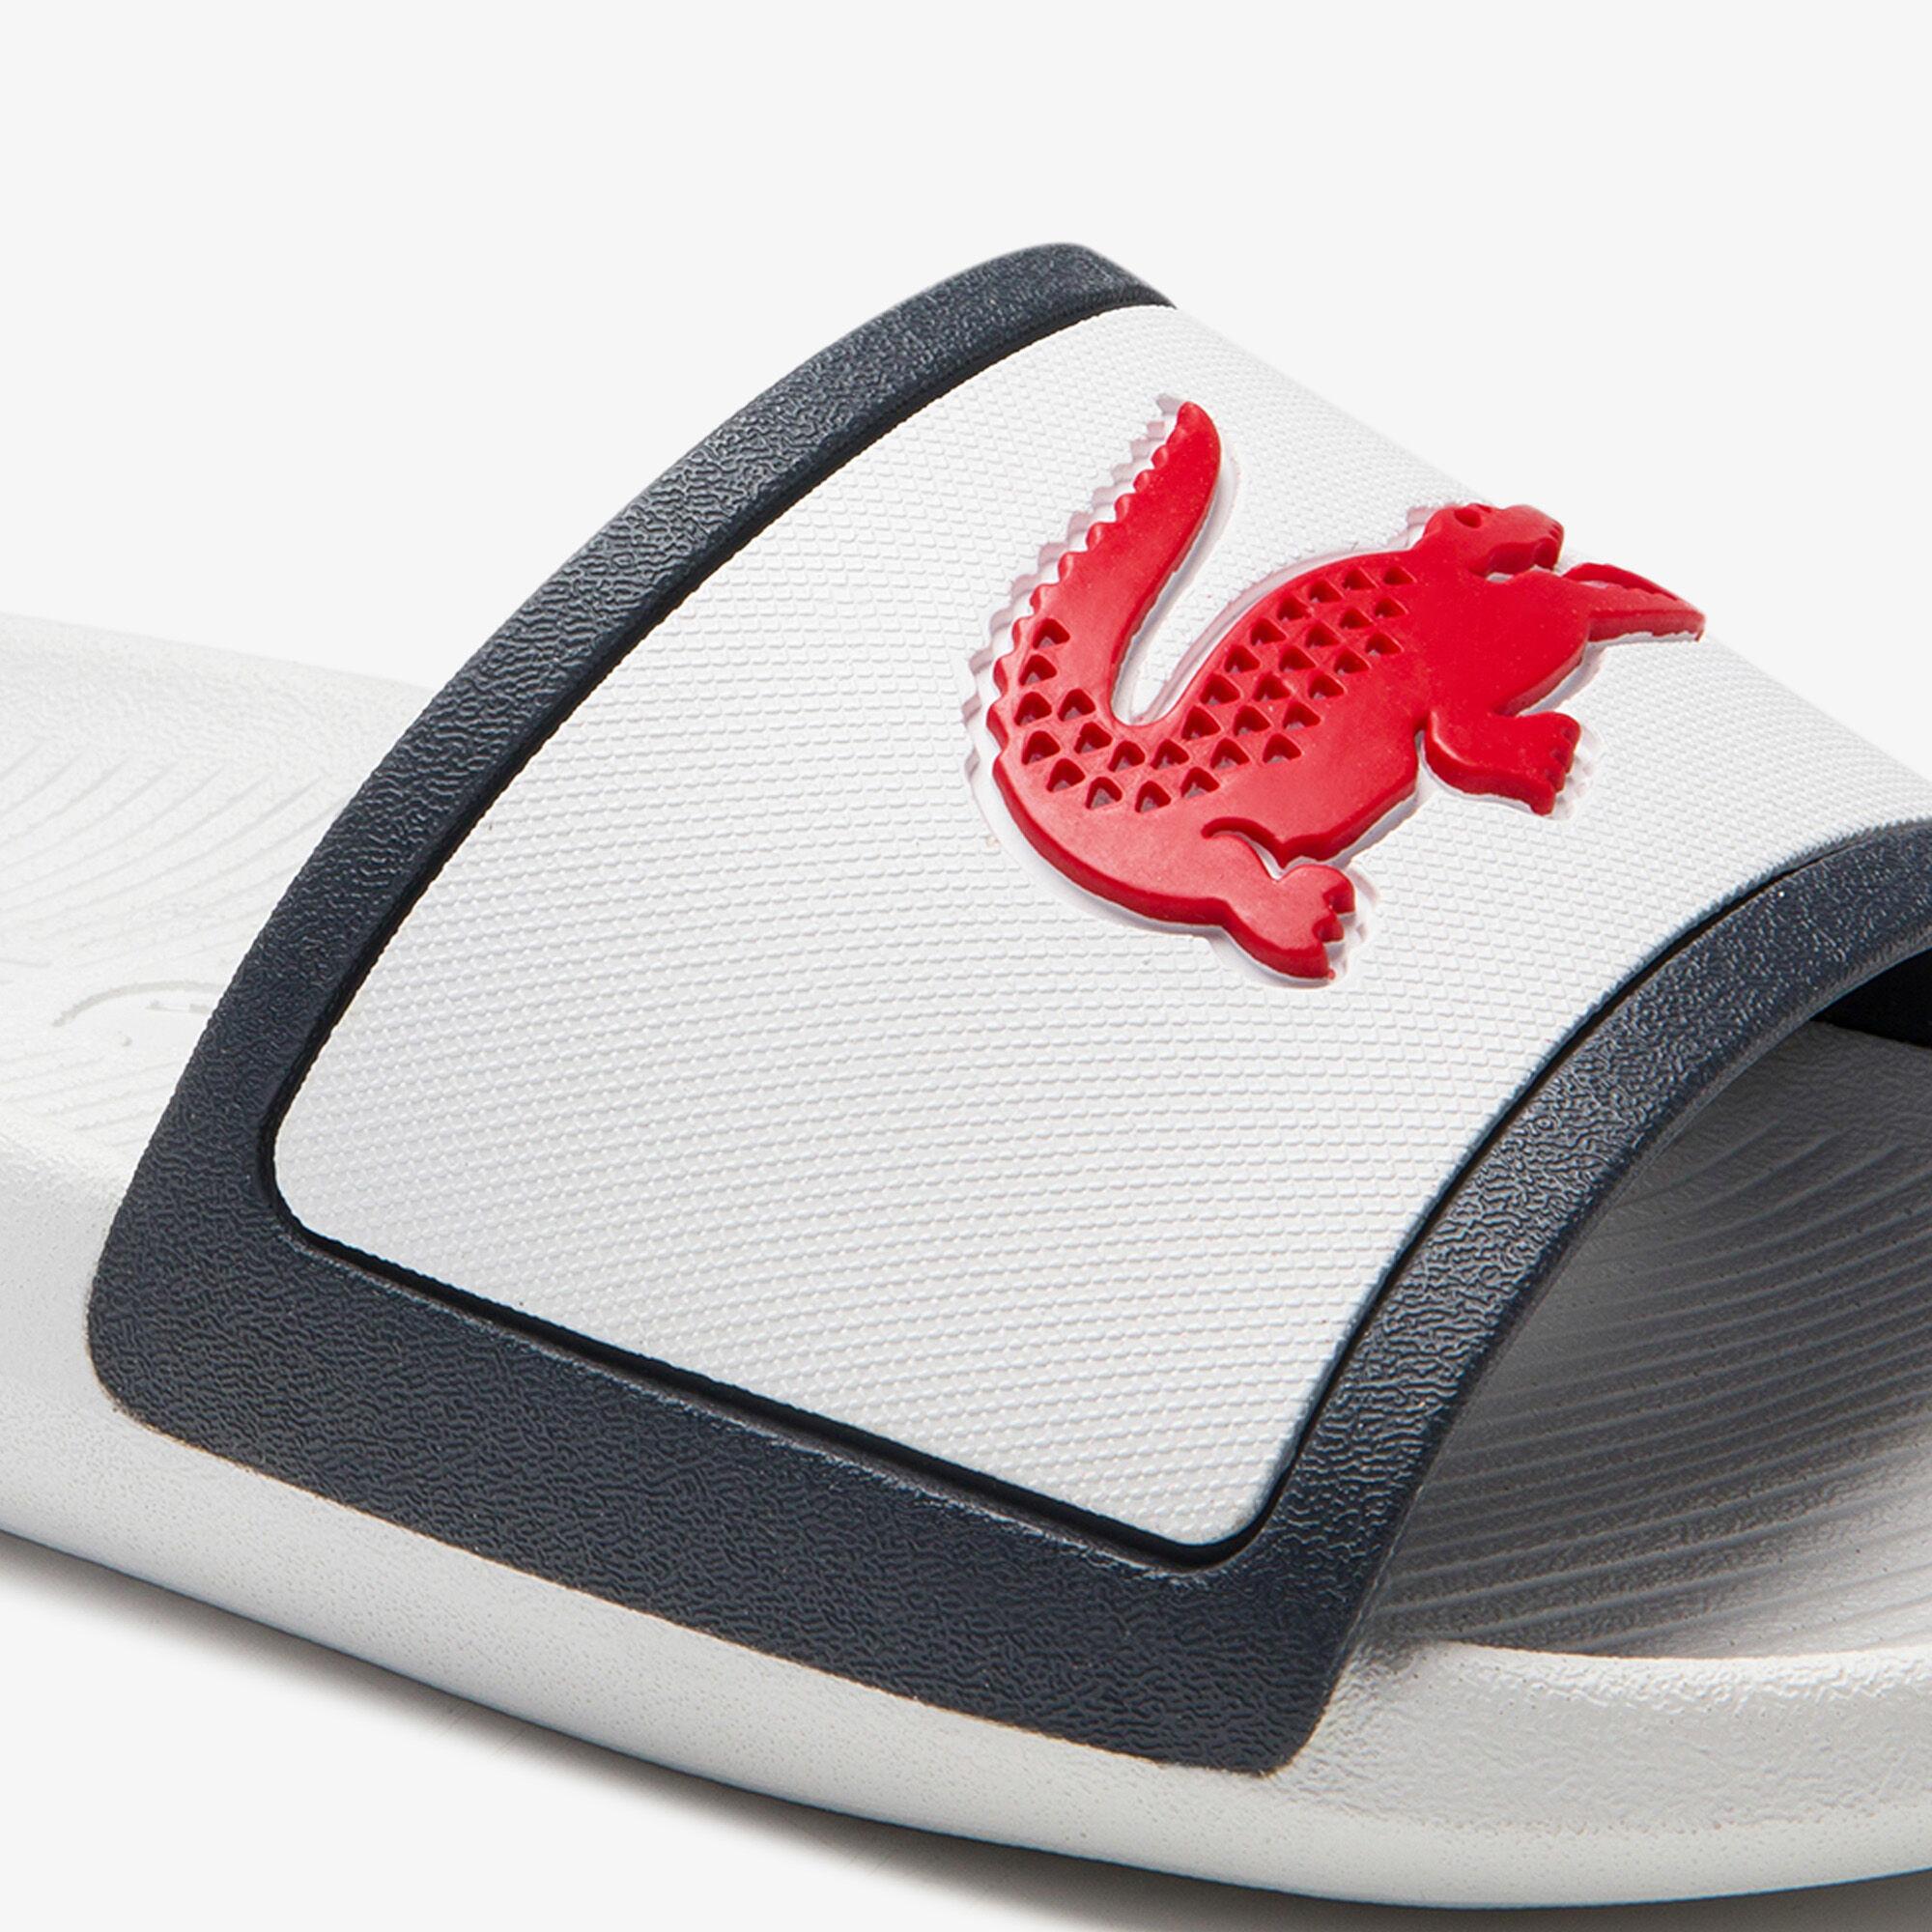 Men's Croco Rubber Strap Synthetic Slides